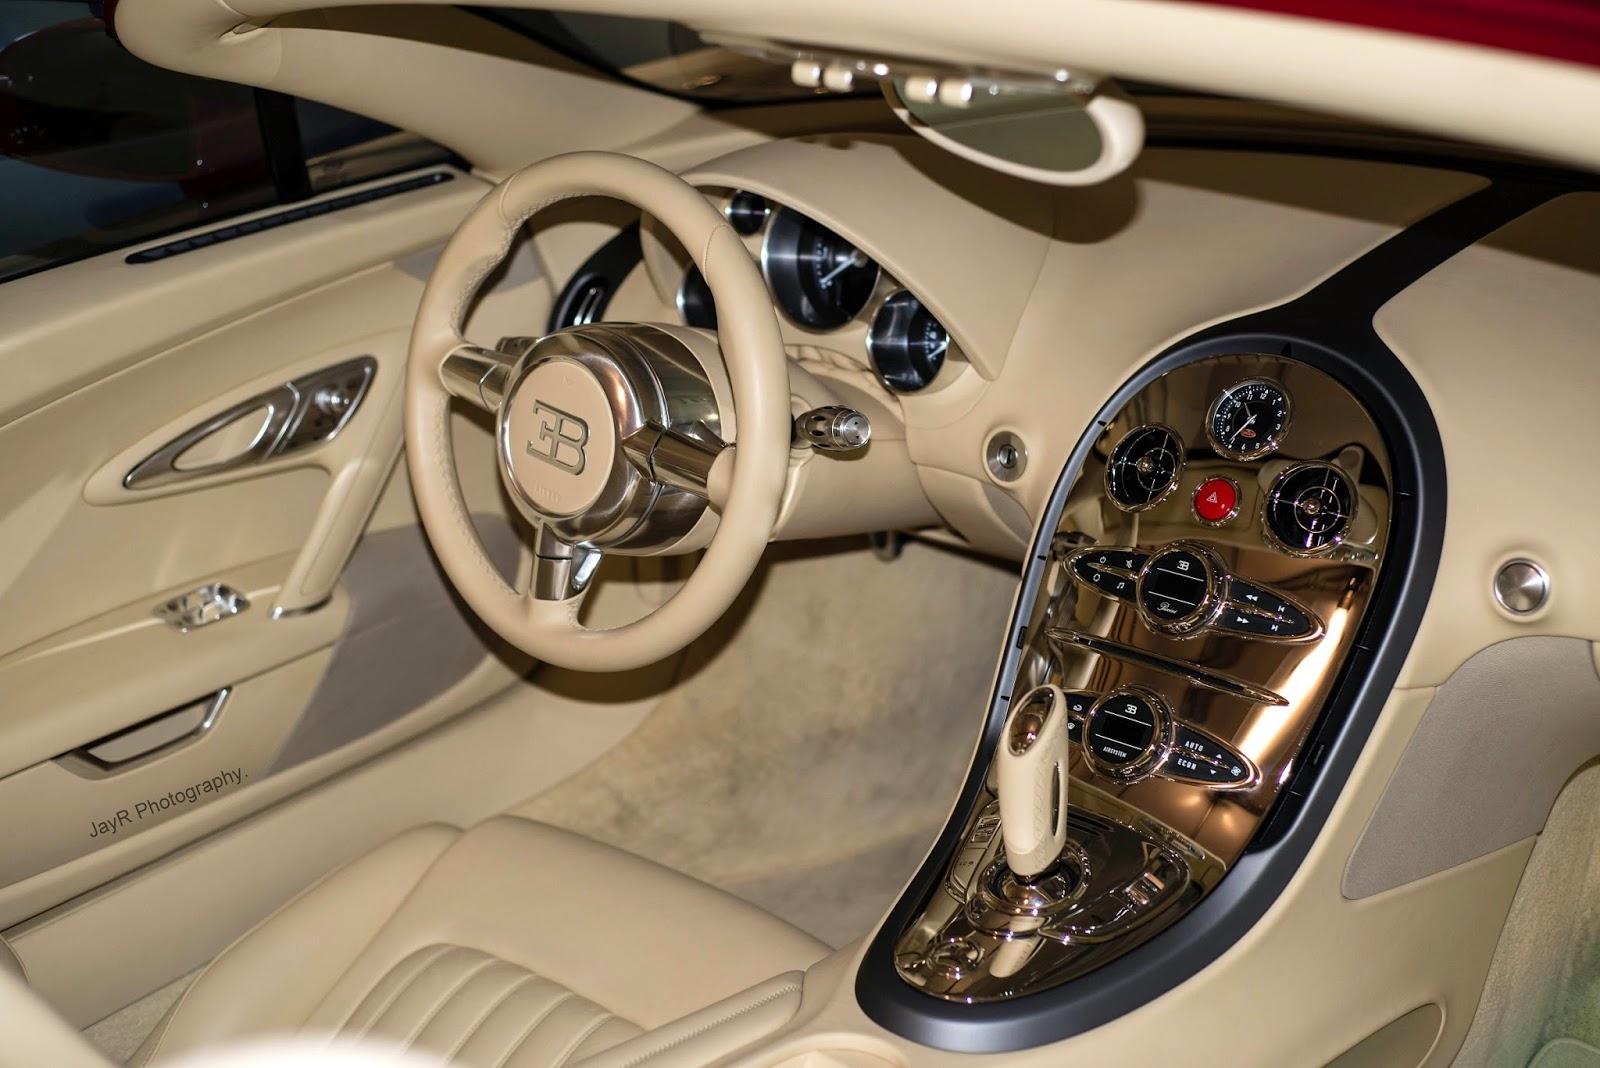 Bugatti Veyron Going Back To The Future Art Promo: Bugatti Veyron 16.4 Concept & Veyron Grandsport 669